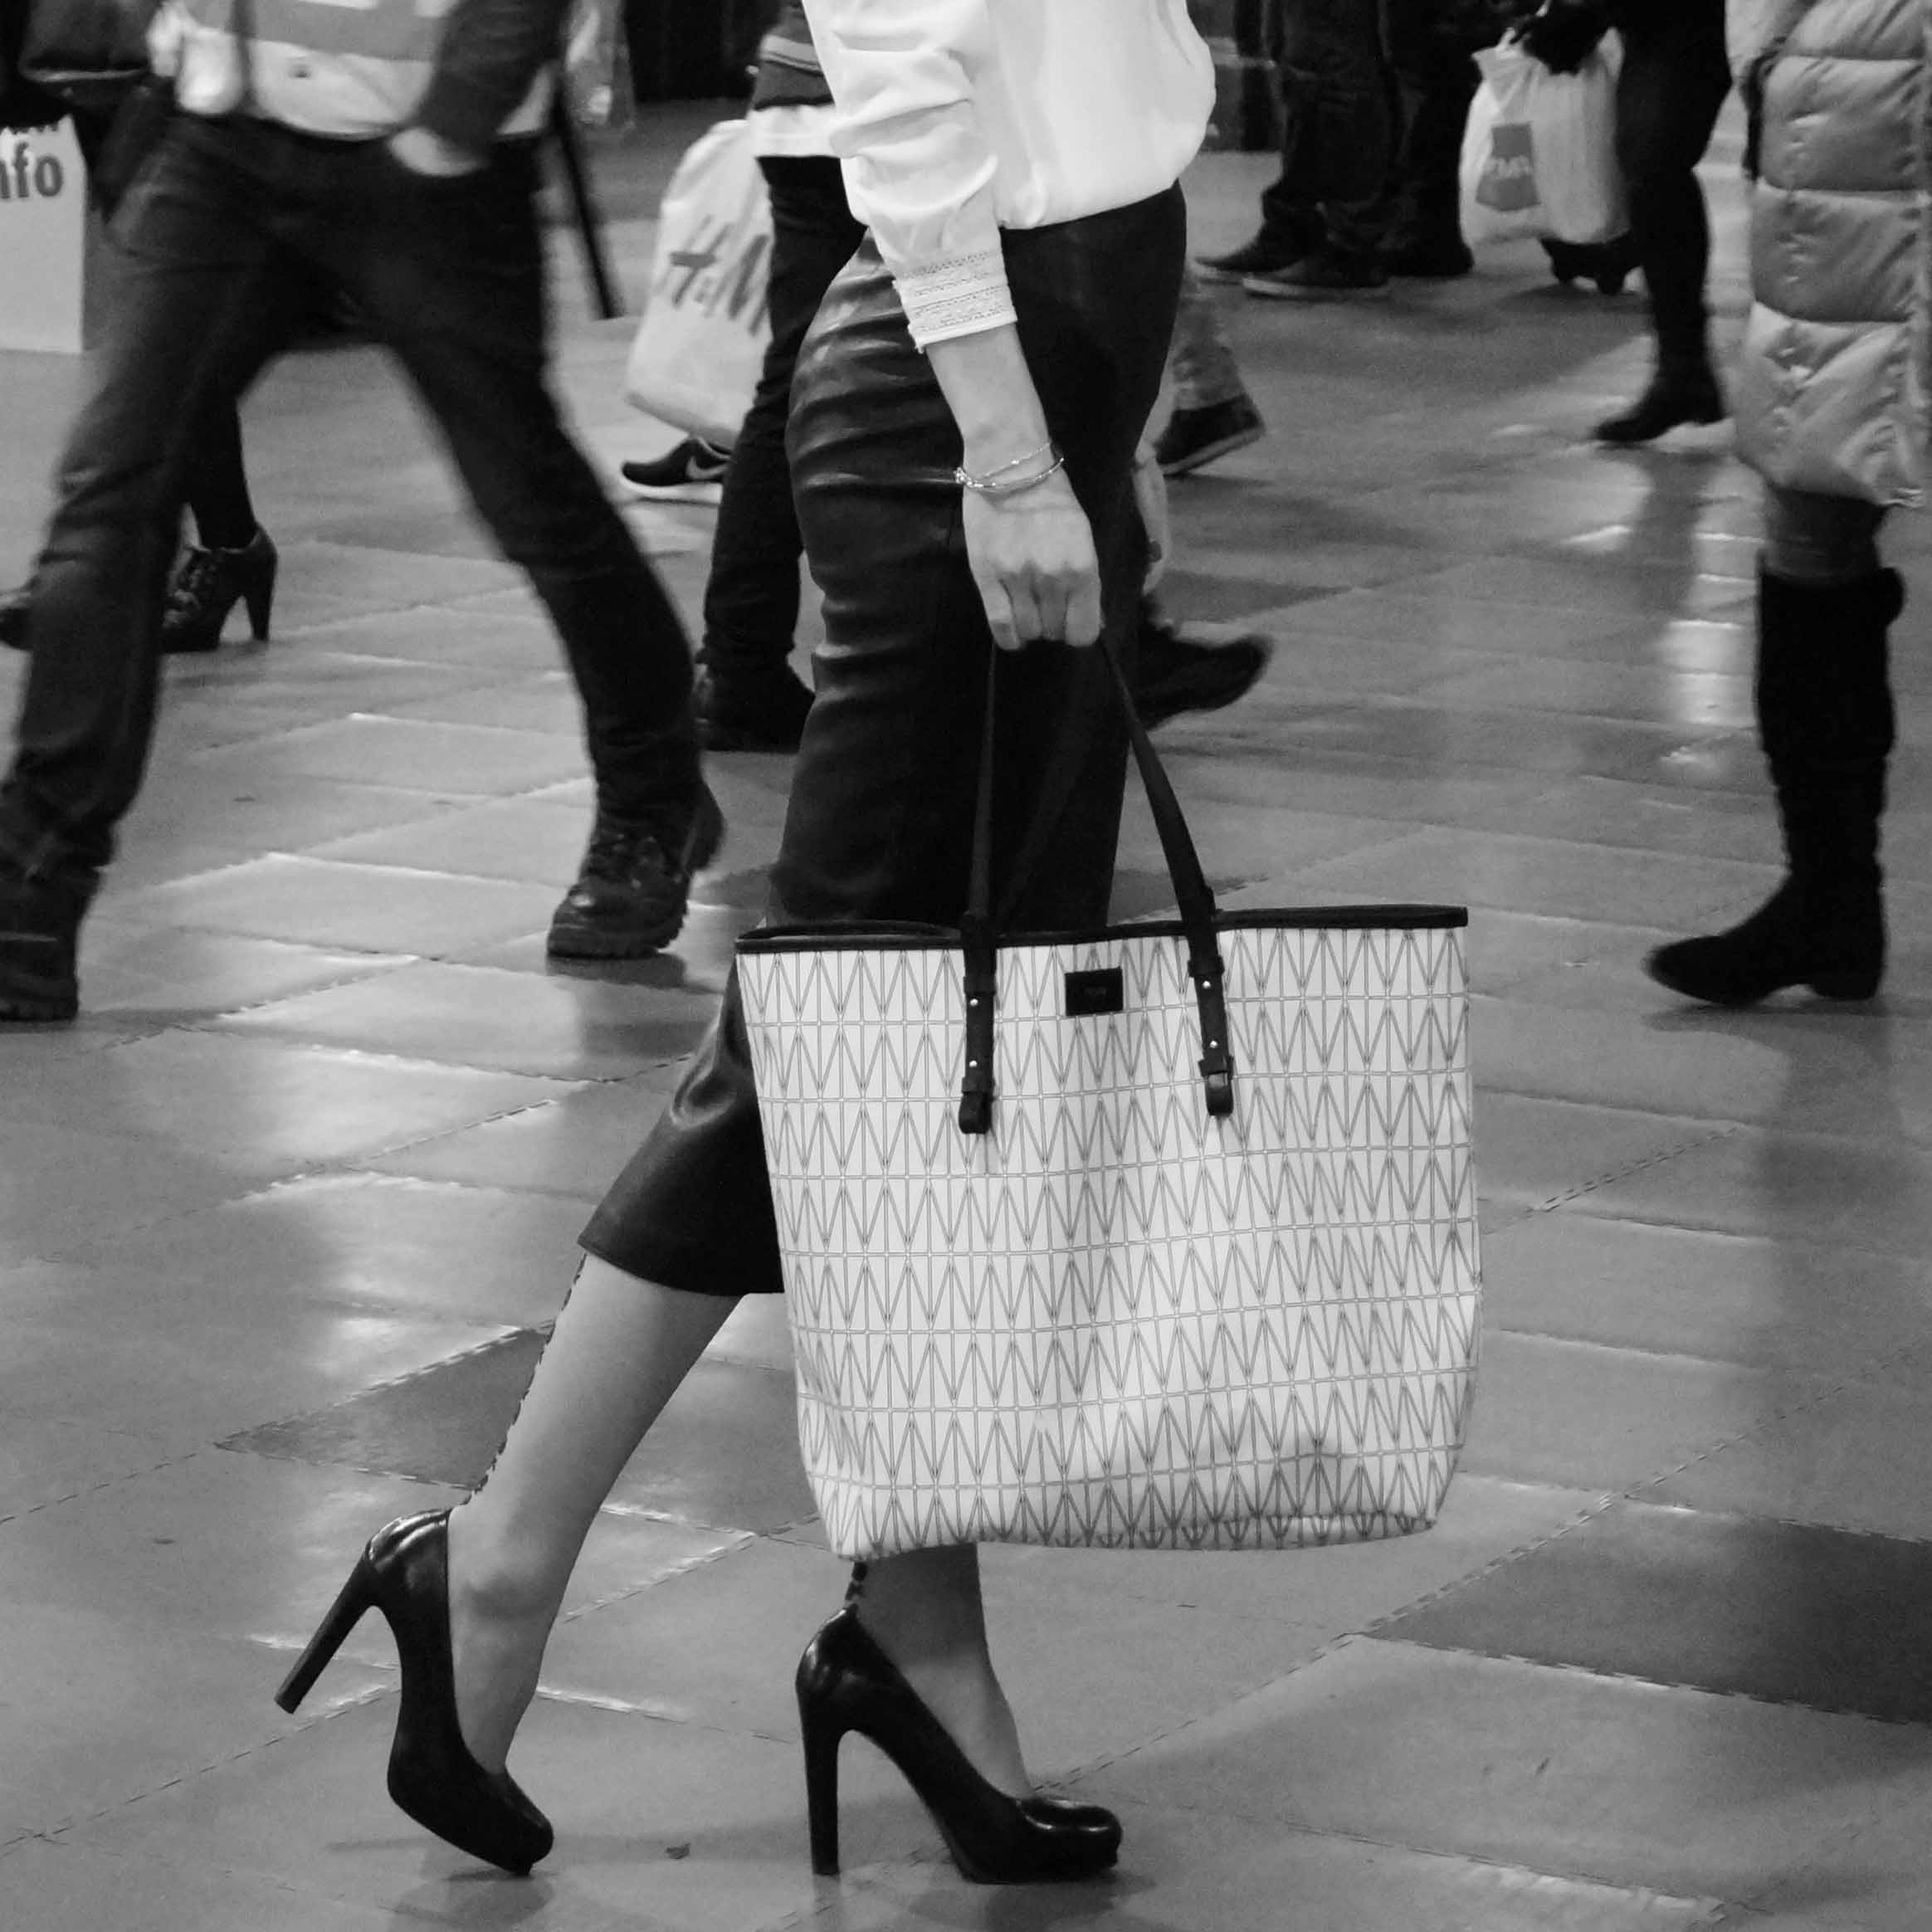 b271be41dc Bag at You - Dagmar - Swedish Fashion Brand - Shopper - Bag at You